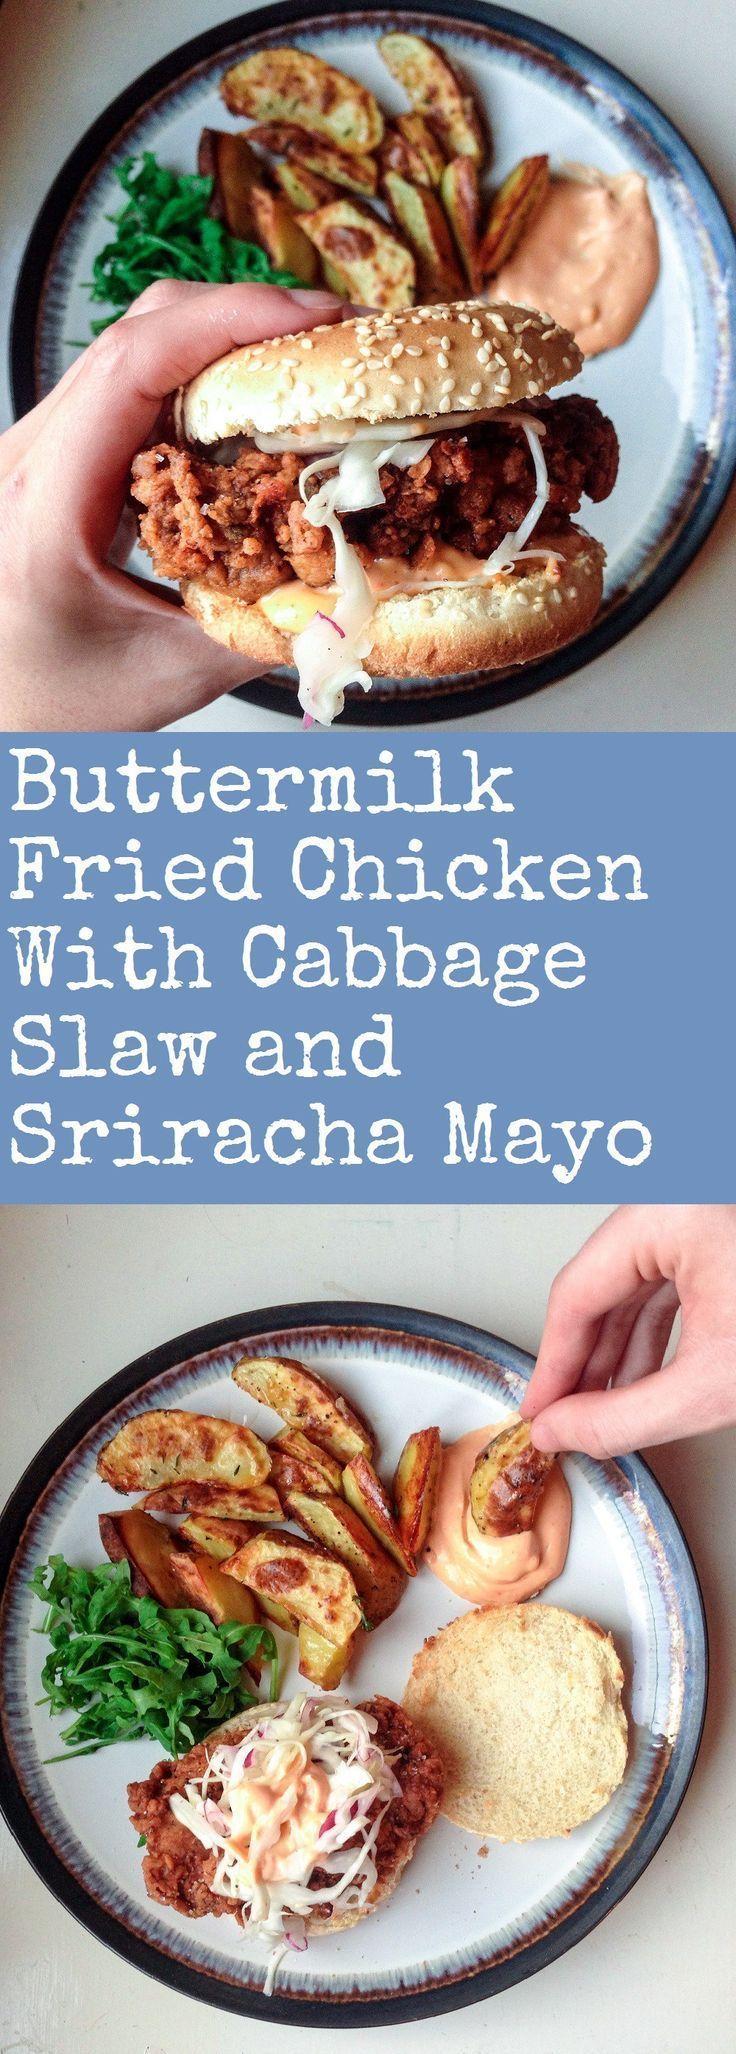 100 sriracha recipes on pinterest sriracha chicken for Table 52 buttermilk fried chicken recipe